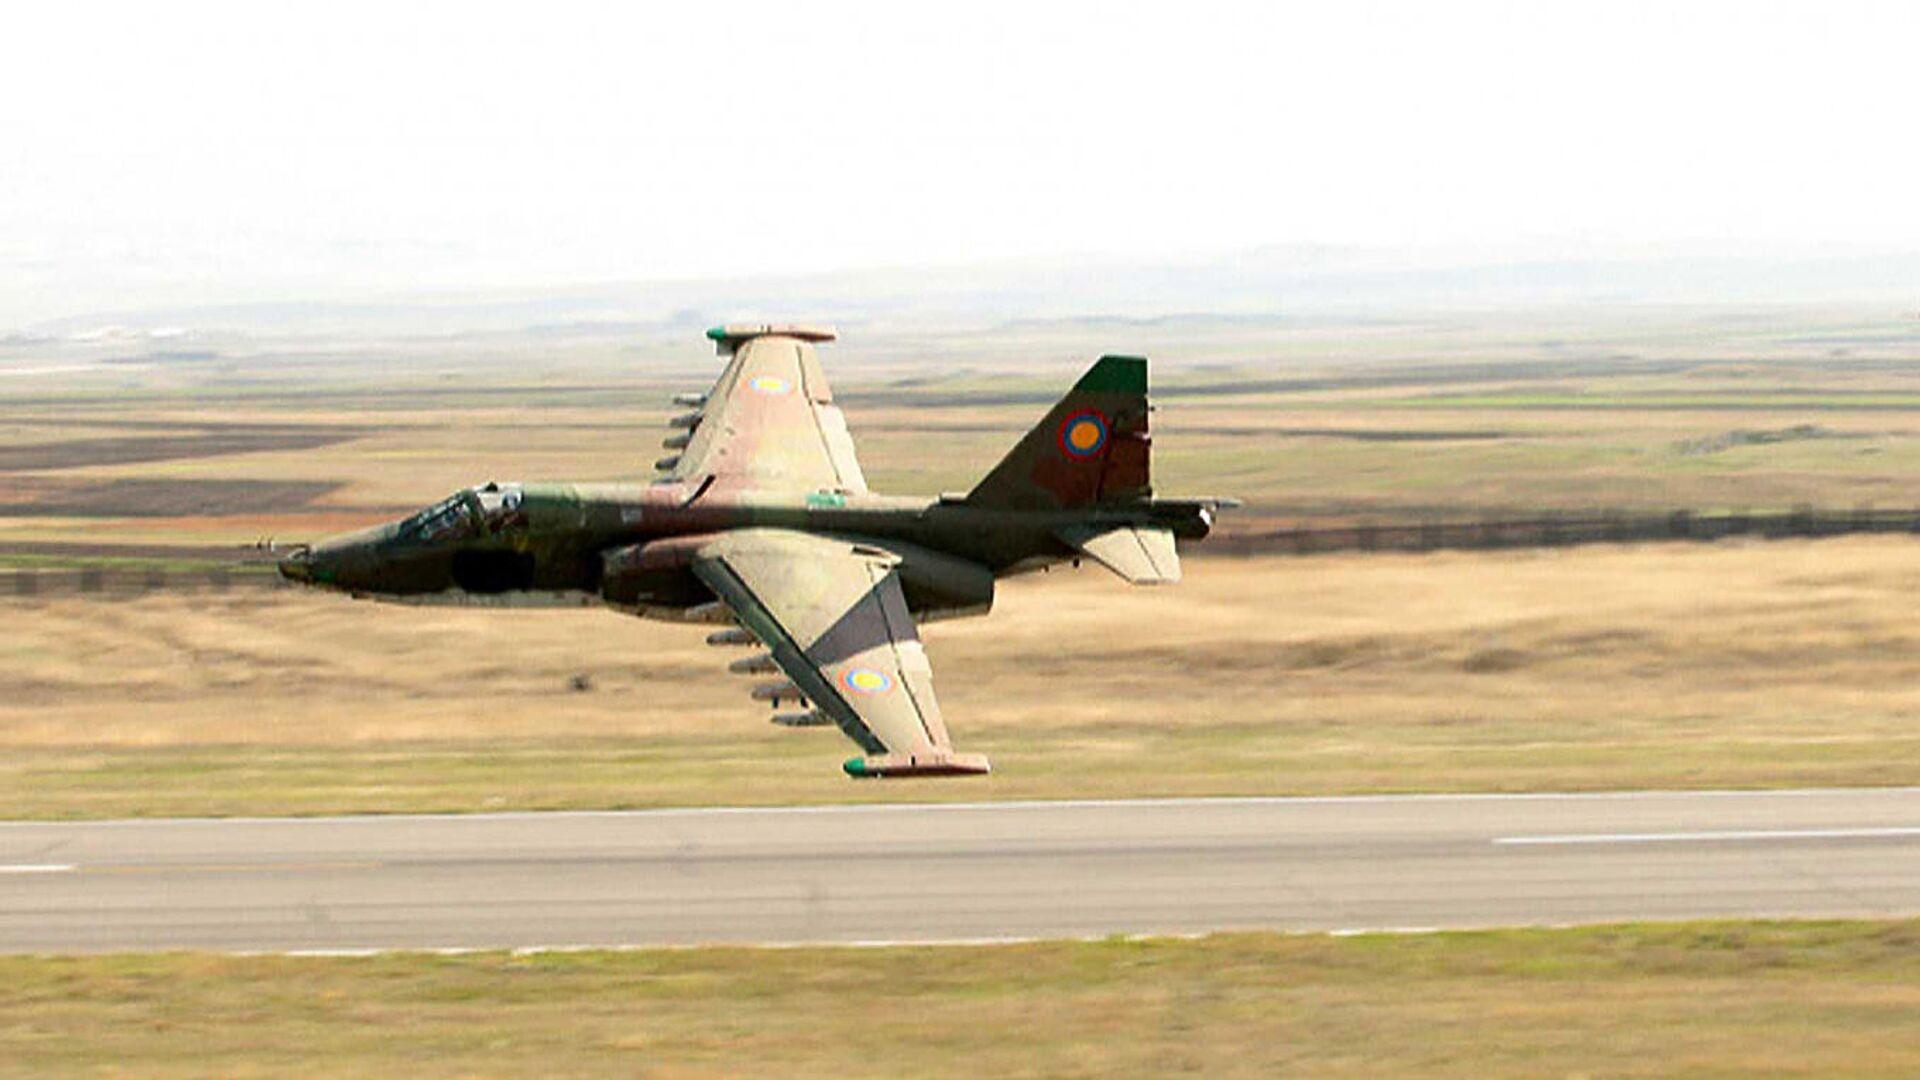 Штурмовик Су-25 ВВС Армении - РИА Новости, 1920, 29.09.2020